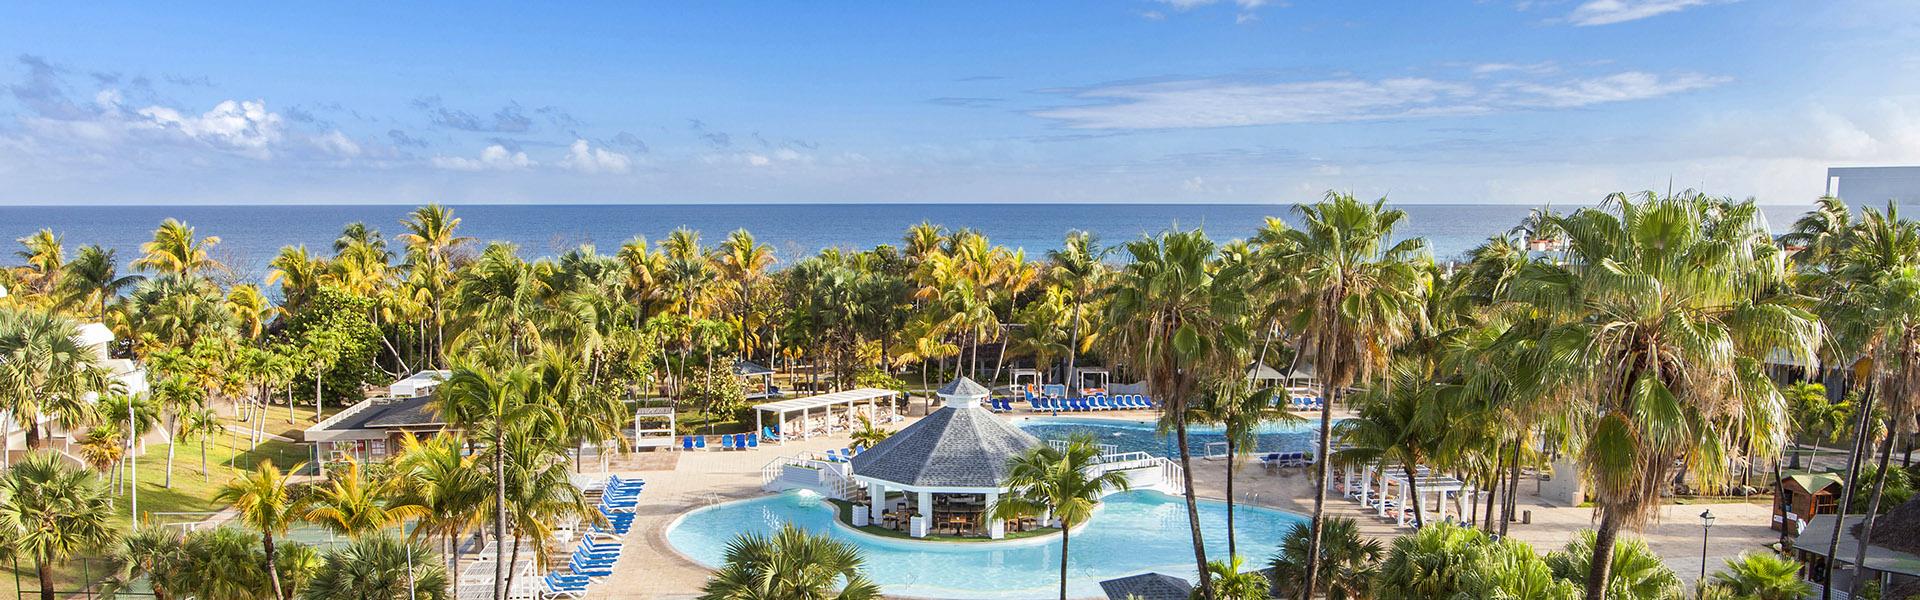 Sol Palmeras - Varadero Cuba - Meliá Cuba Hotels